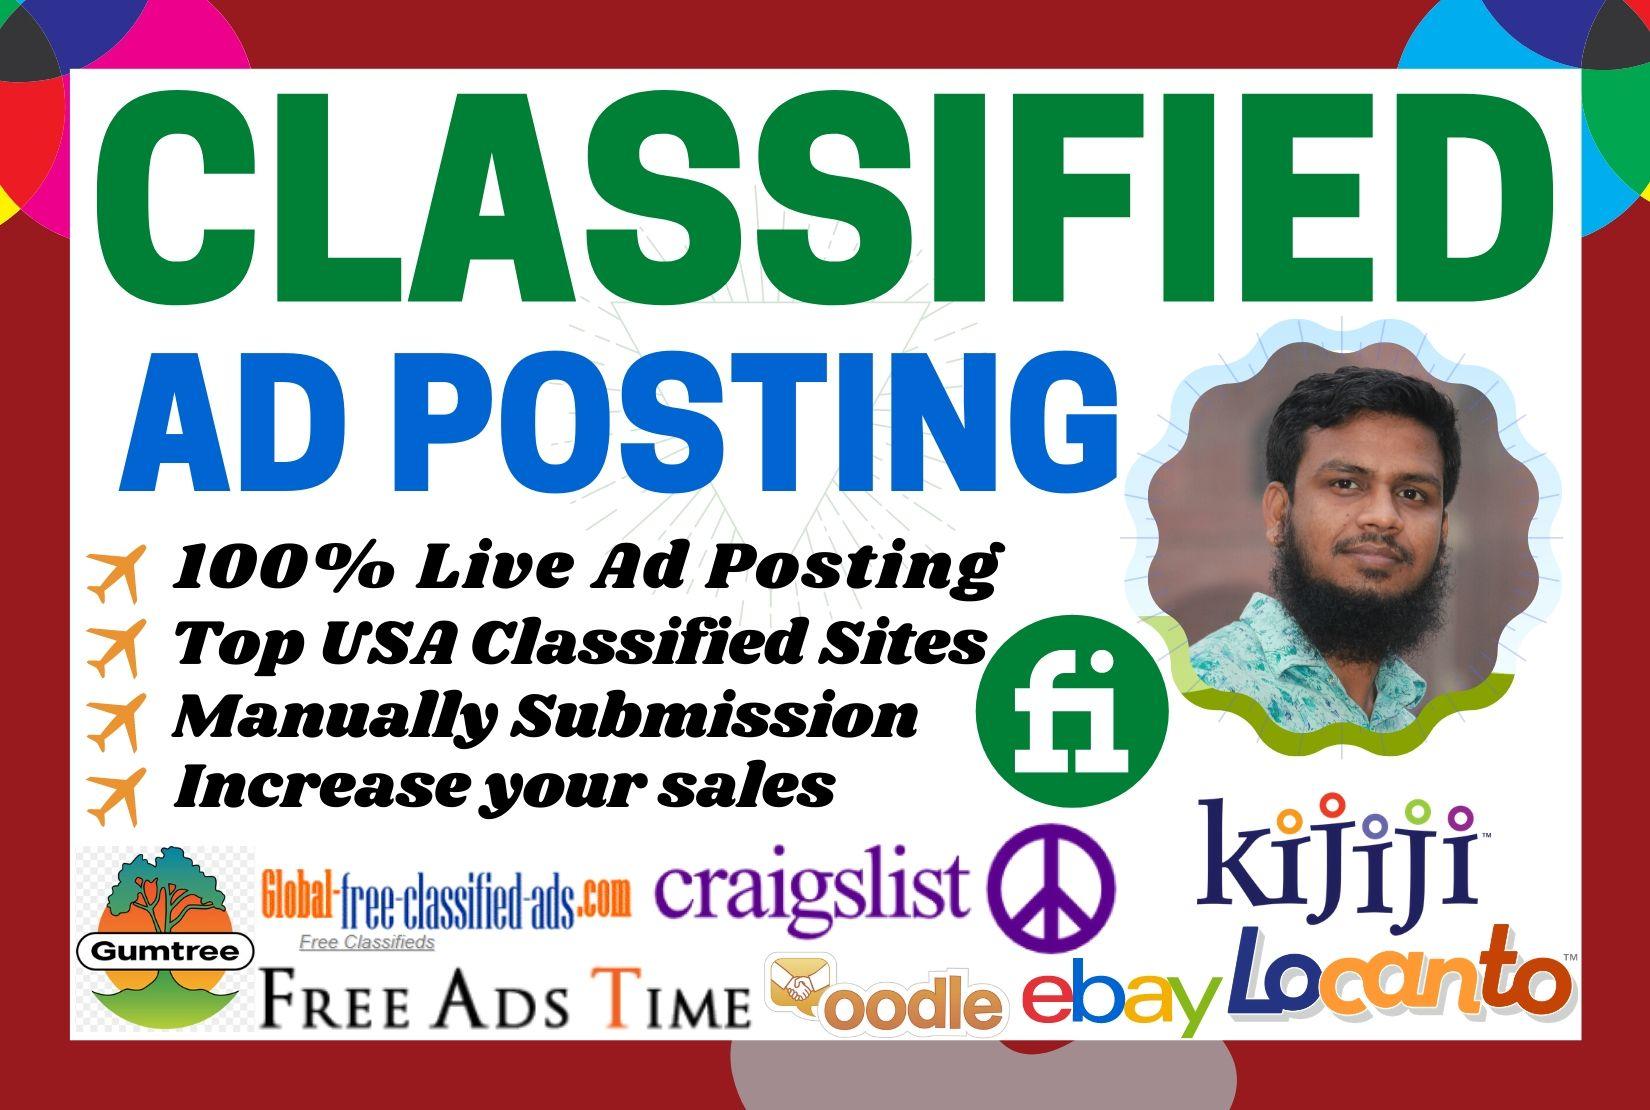 shafiqulislam72 I will do manually classified ad posting